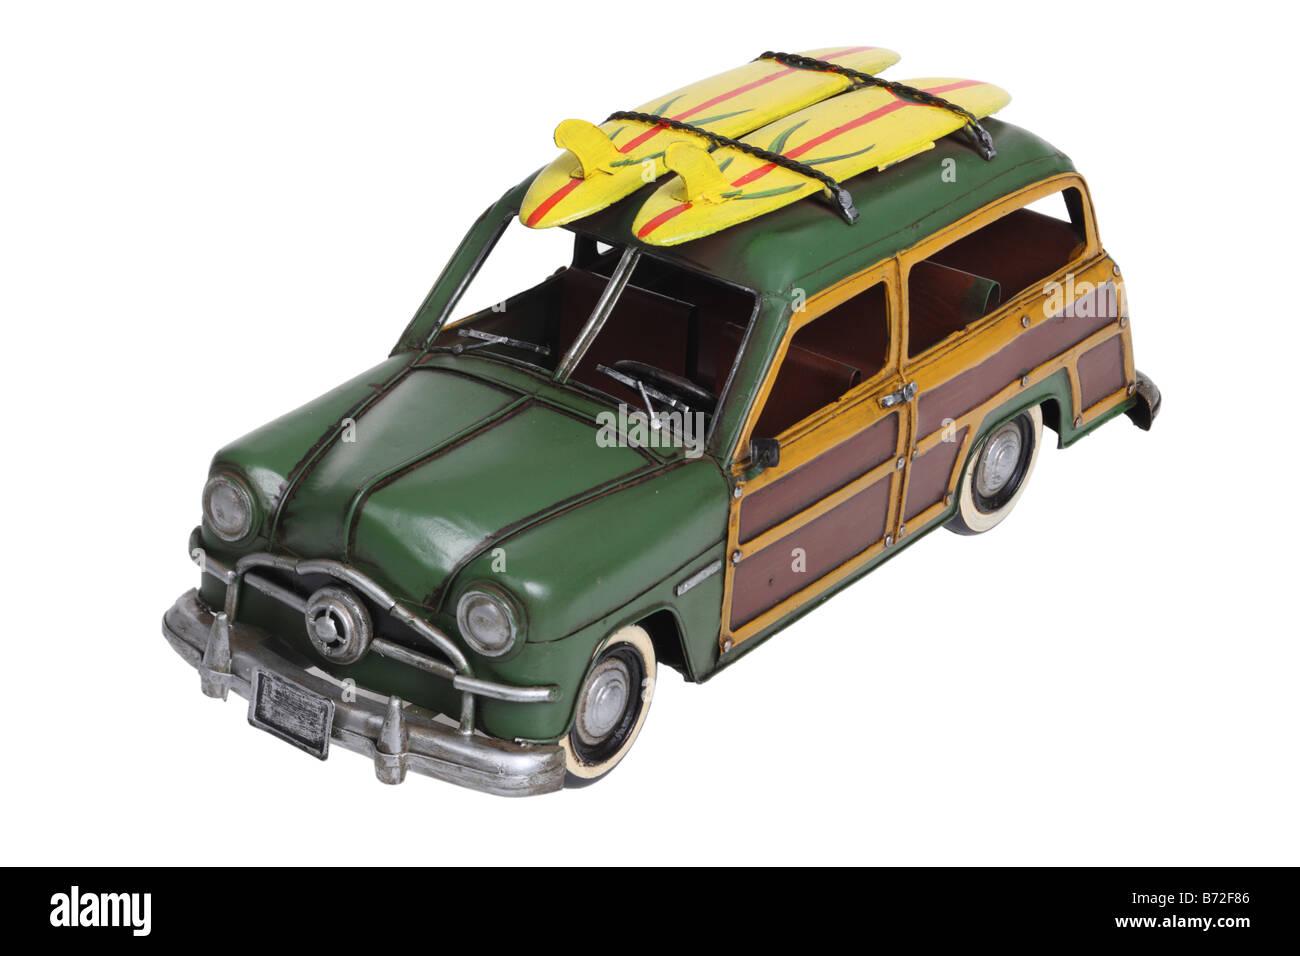 Woody Classic surf modelo de automóvil recortadas sobre fondo blanco. Imagen De Stock